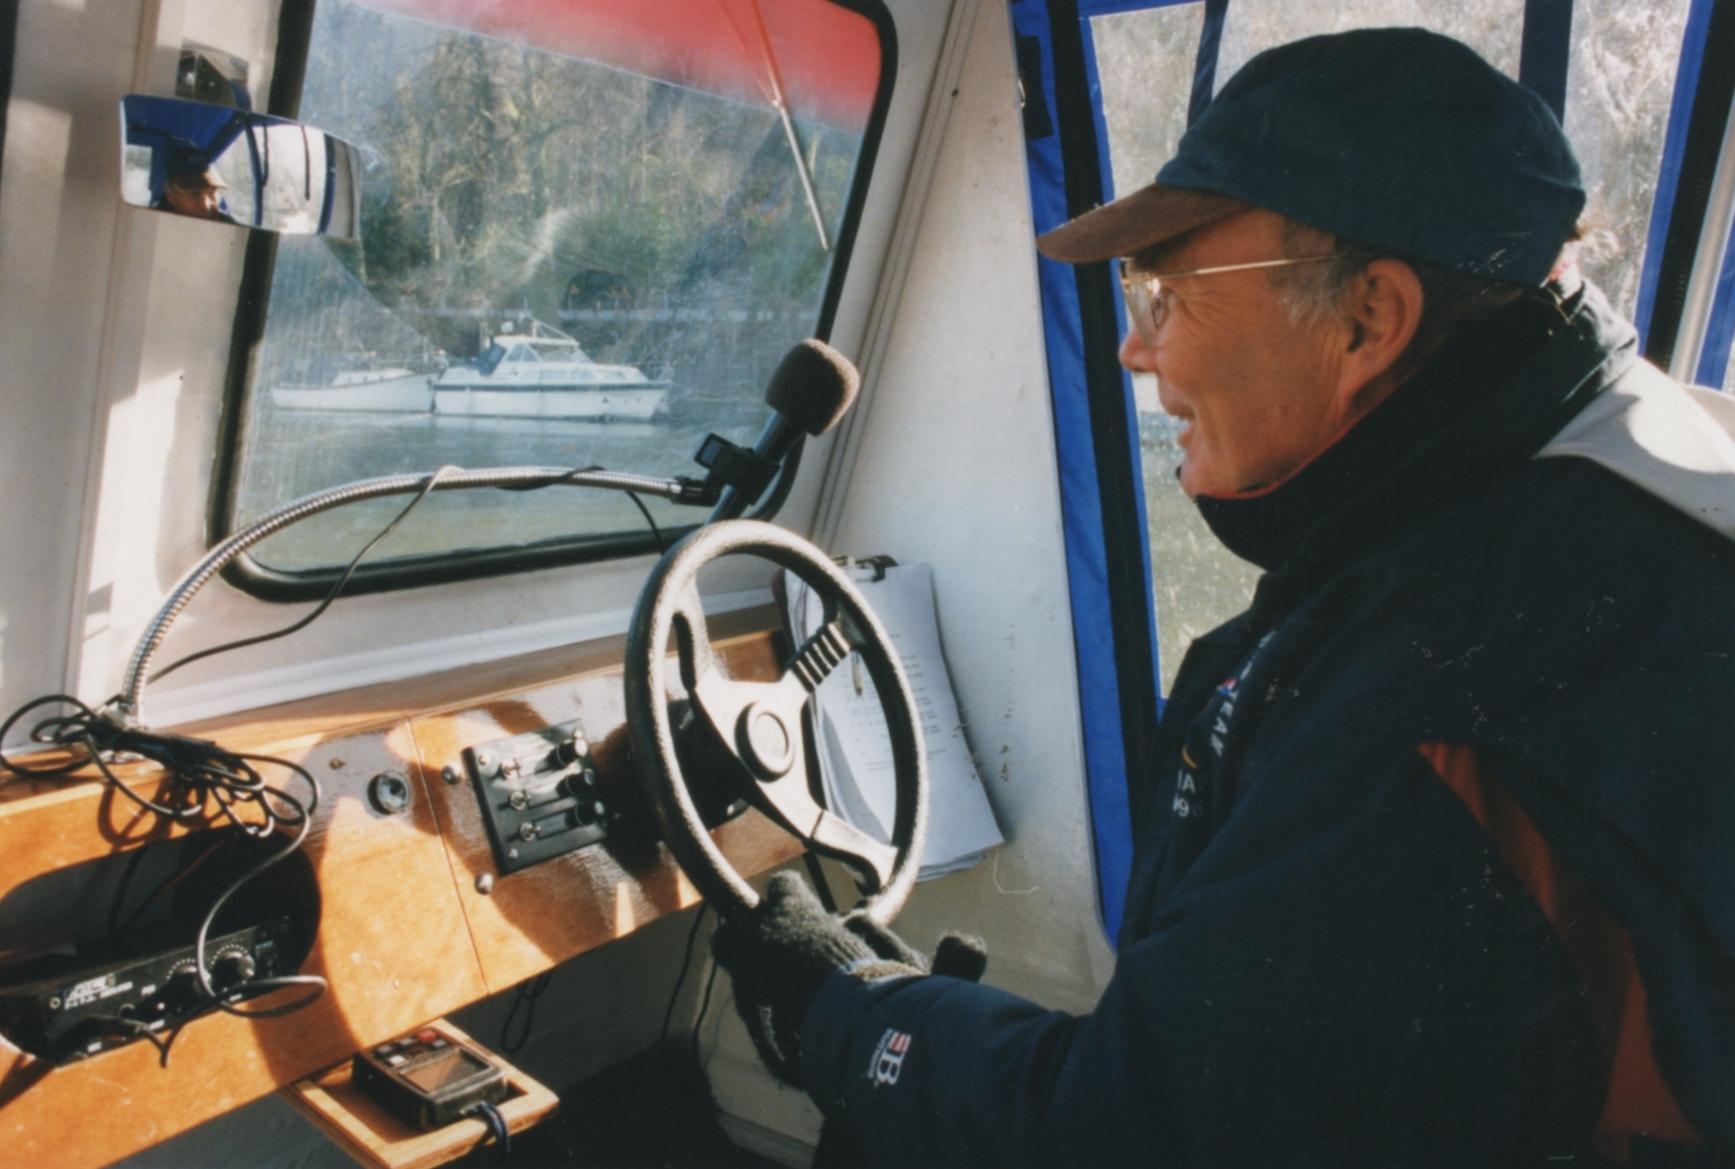 inside the catamaran